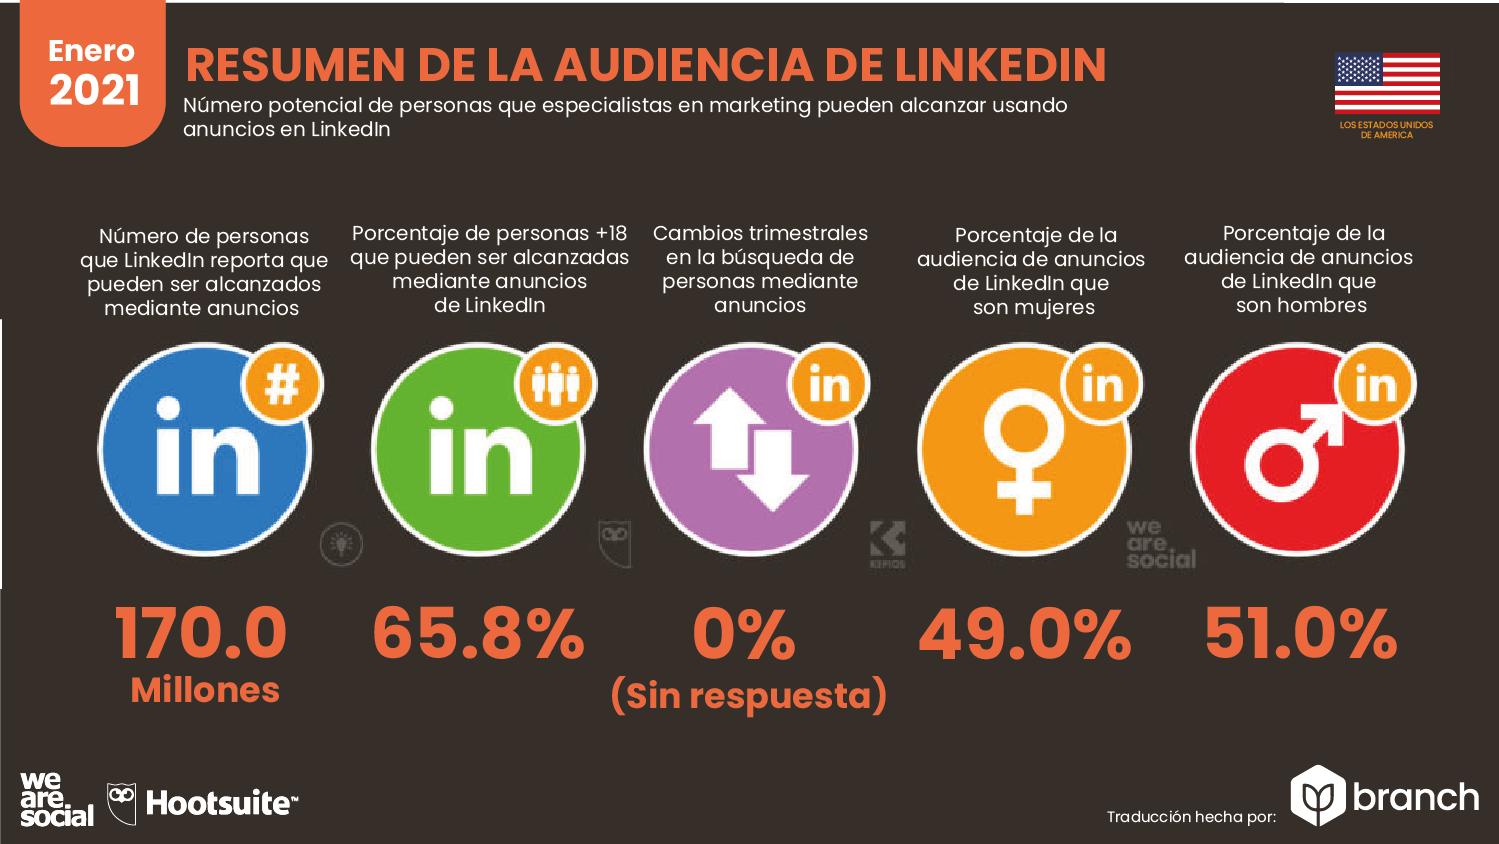 audiencia-de-LinkedIn-en-usa-2020-2021